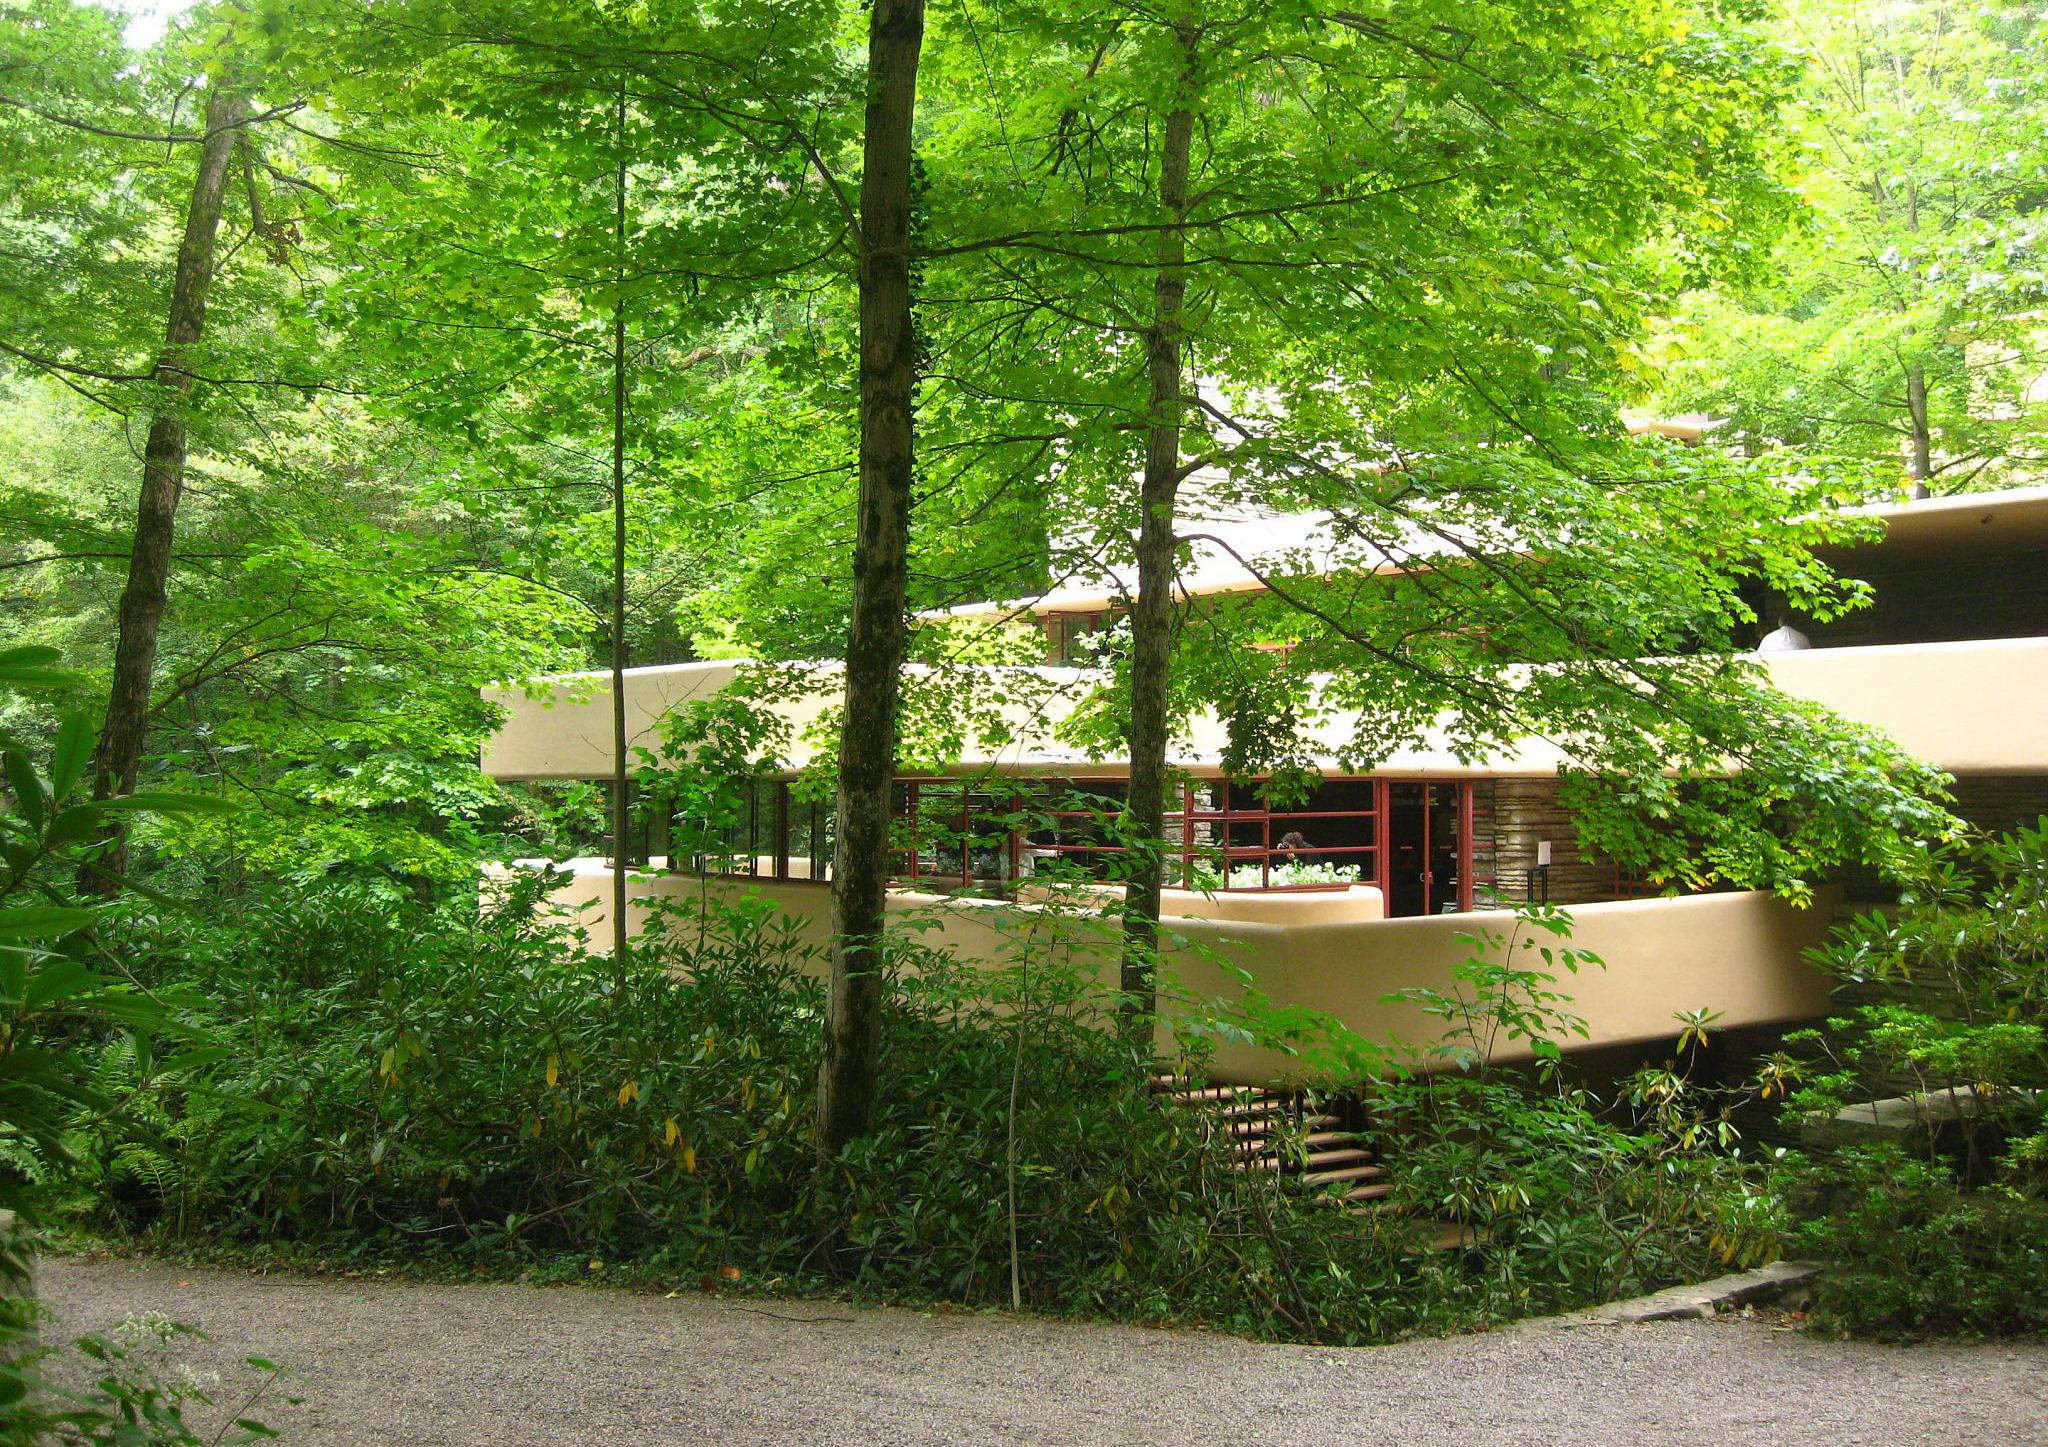 arquitectura  rase una vez Niels H Abel y Evariste Galois  Pgina 5